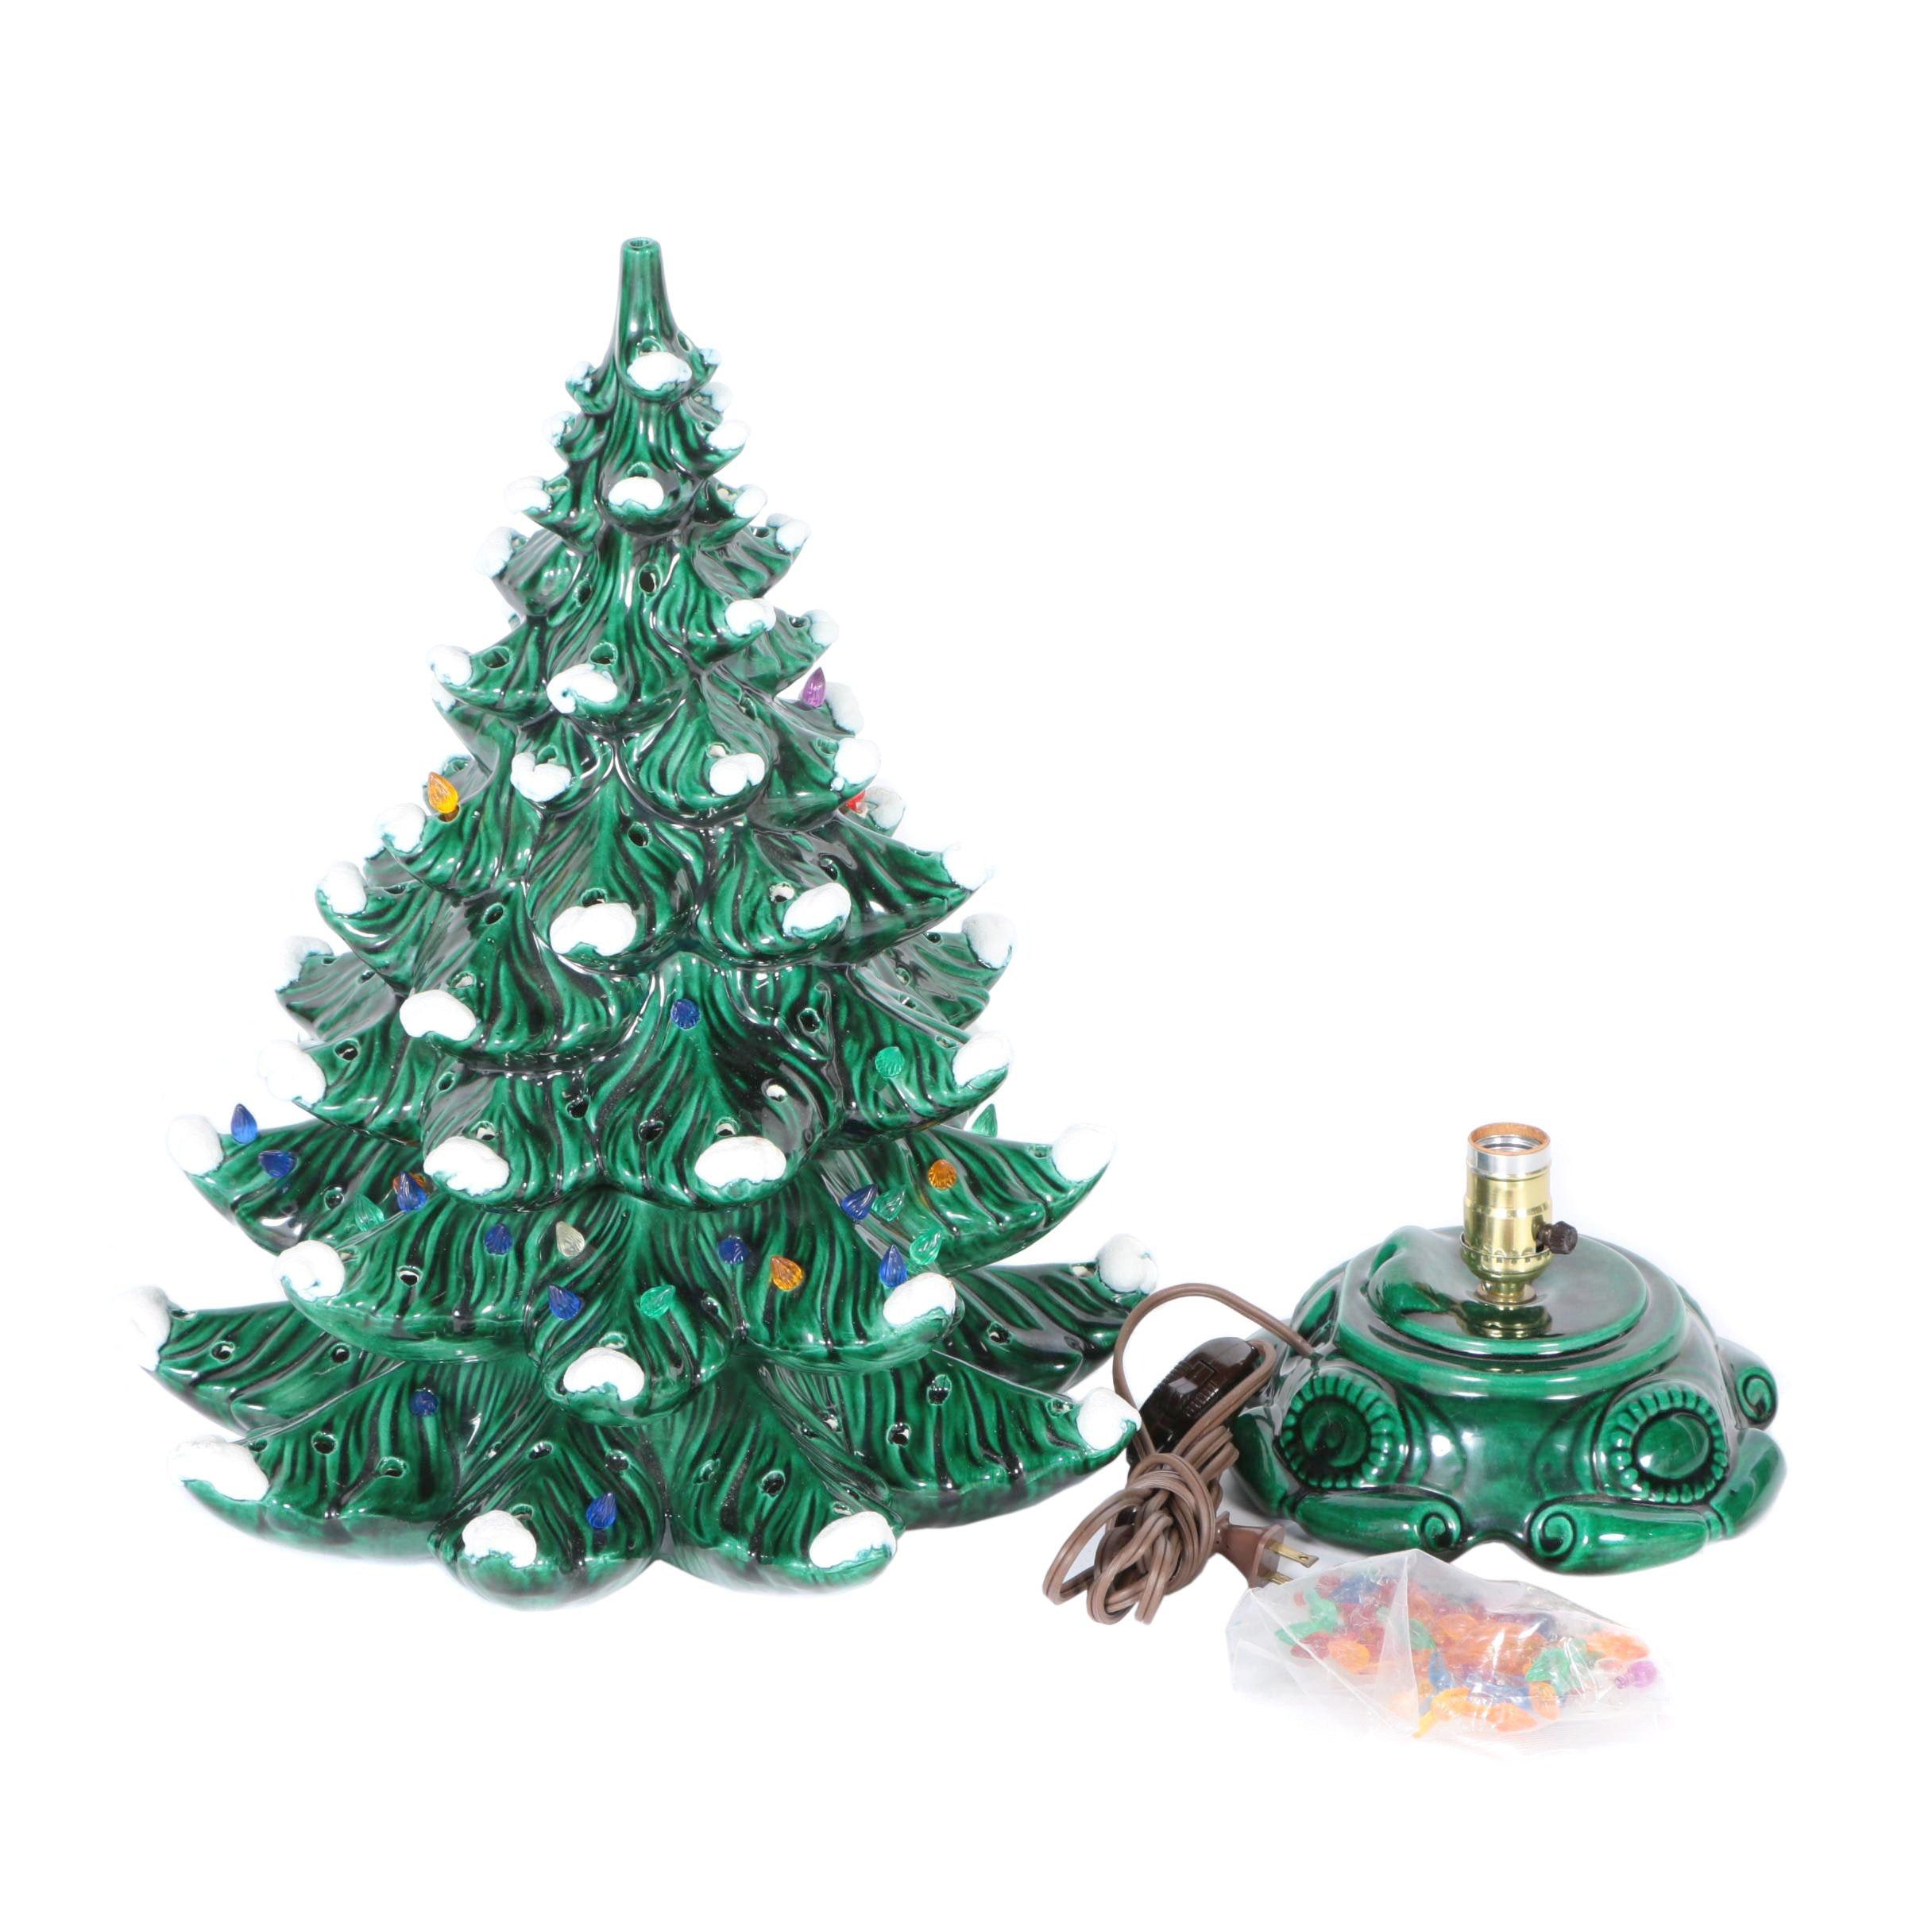 Lighted Christmas Decor with Majolica Glaze